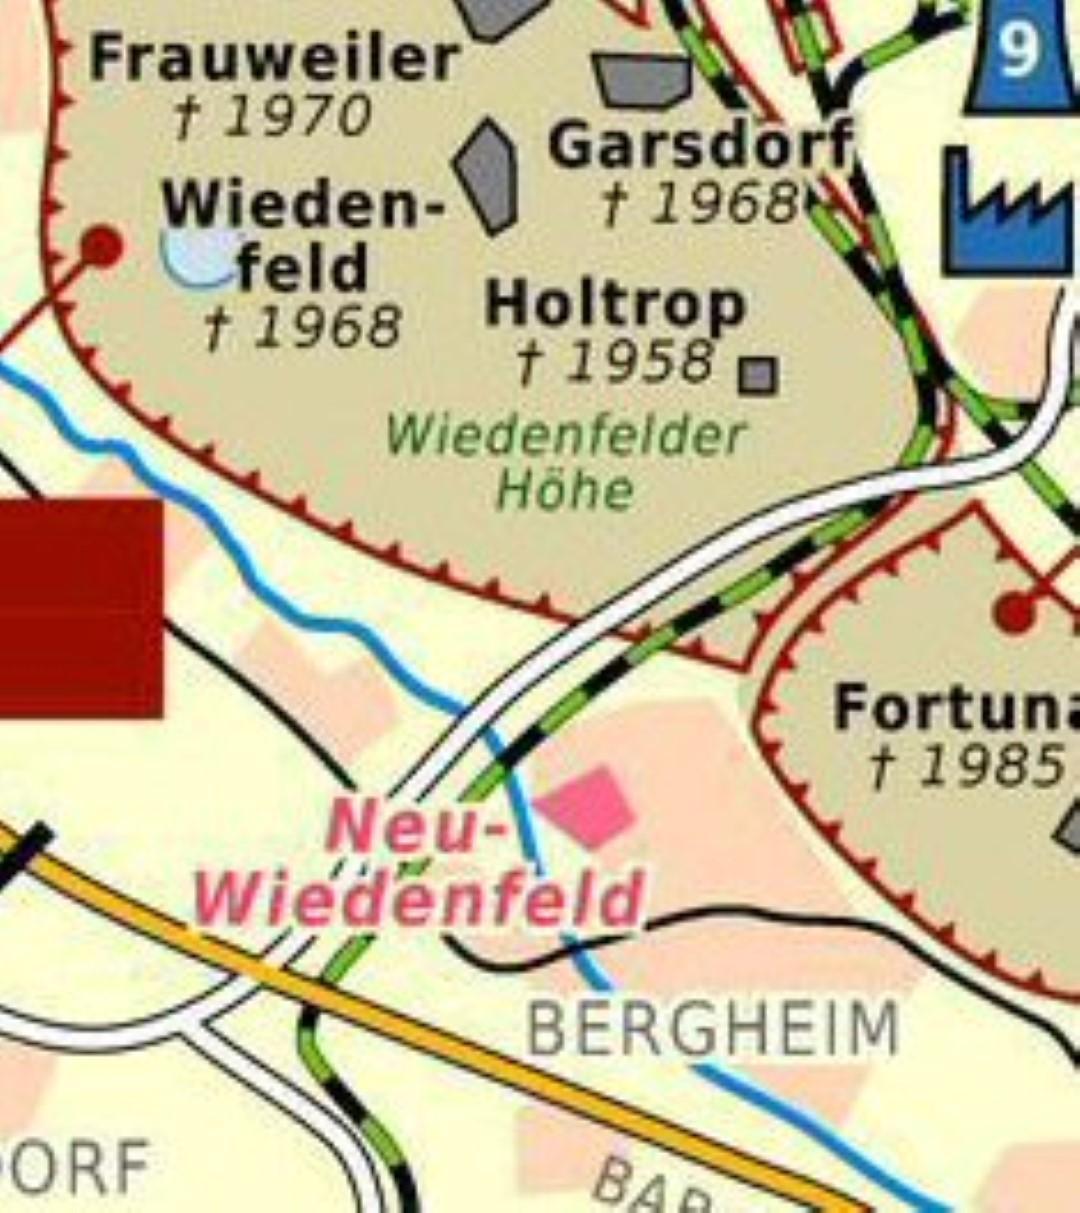 Bergheim -  Holtrop L